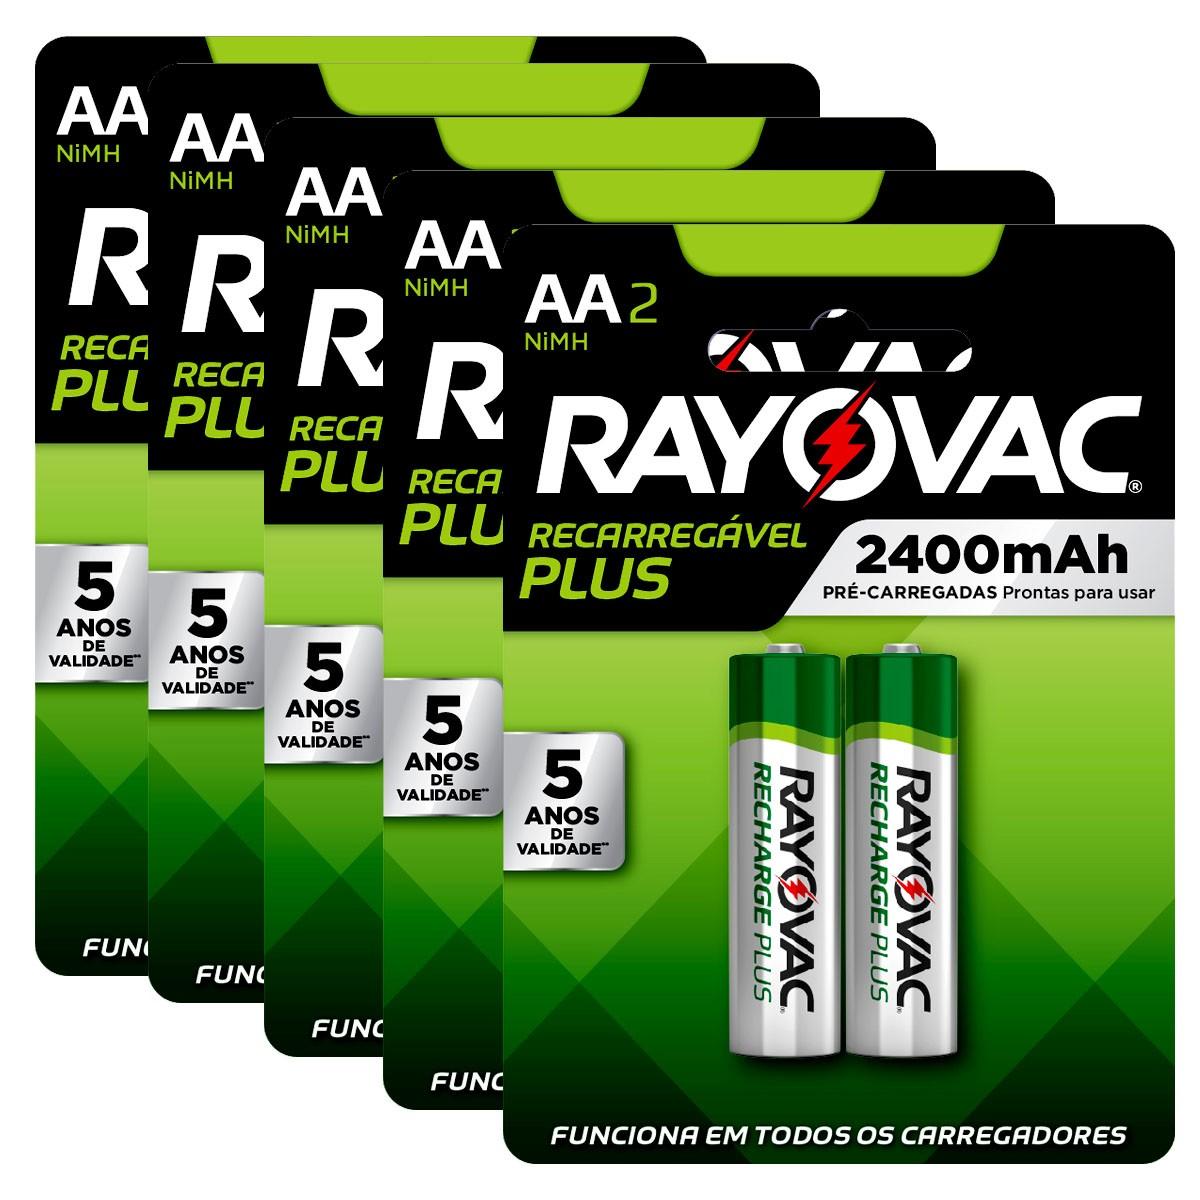 10 Pilhas AA Recarregável 2400mAh RAYOVAC 5 cartelas